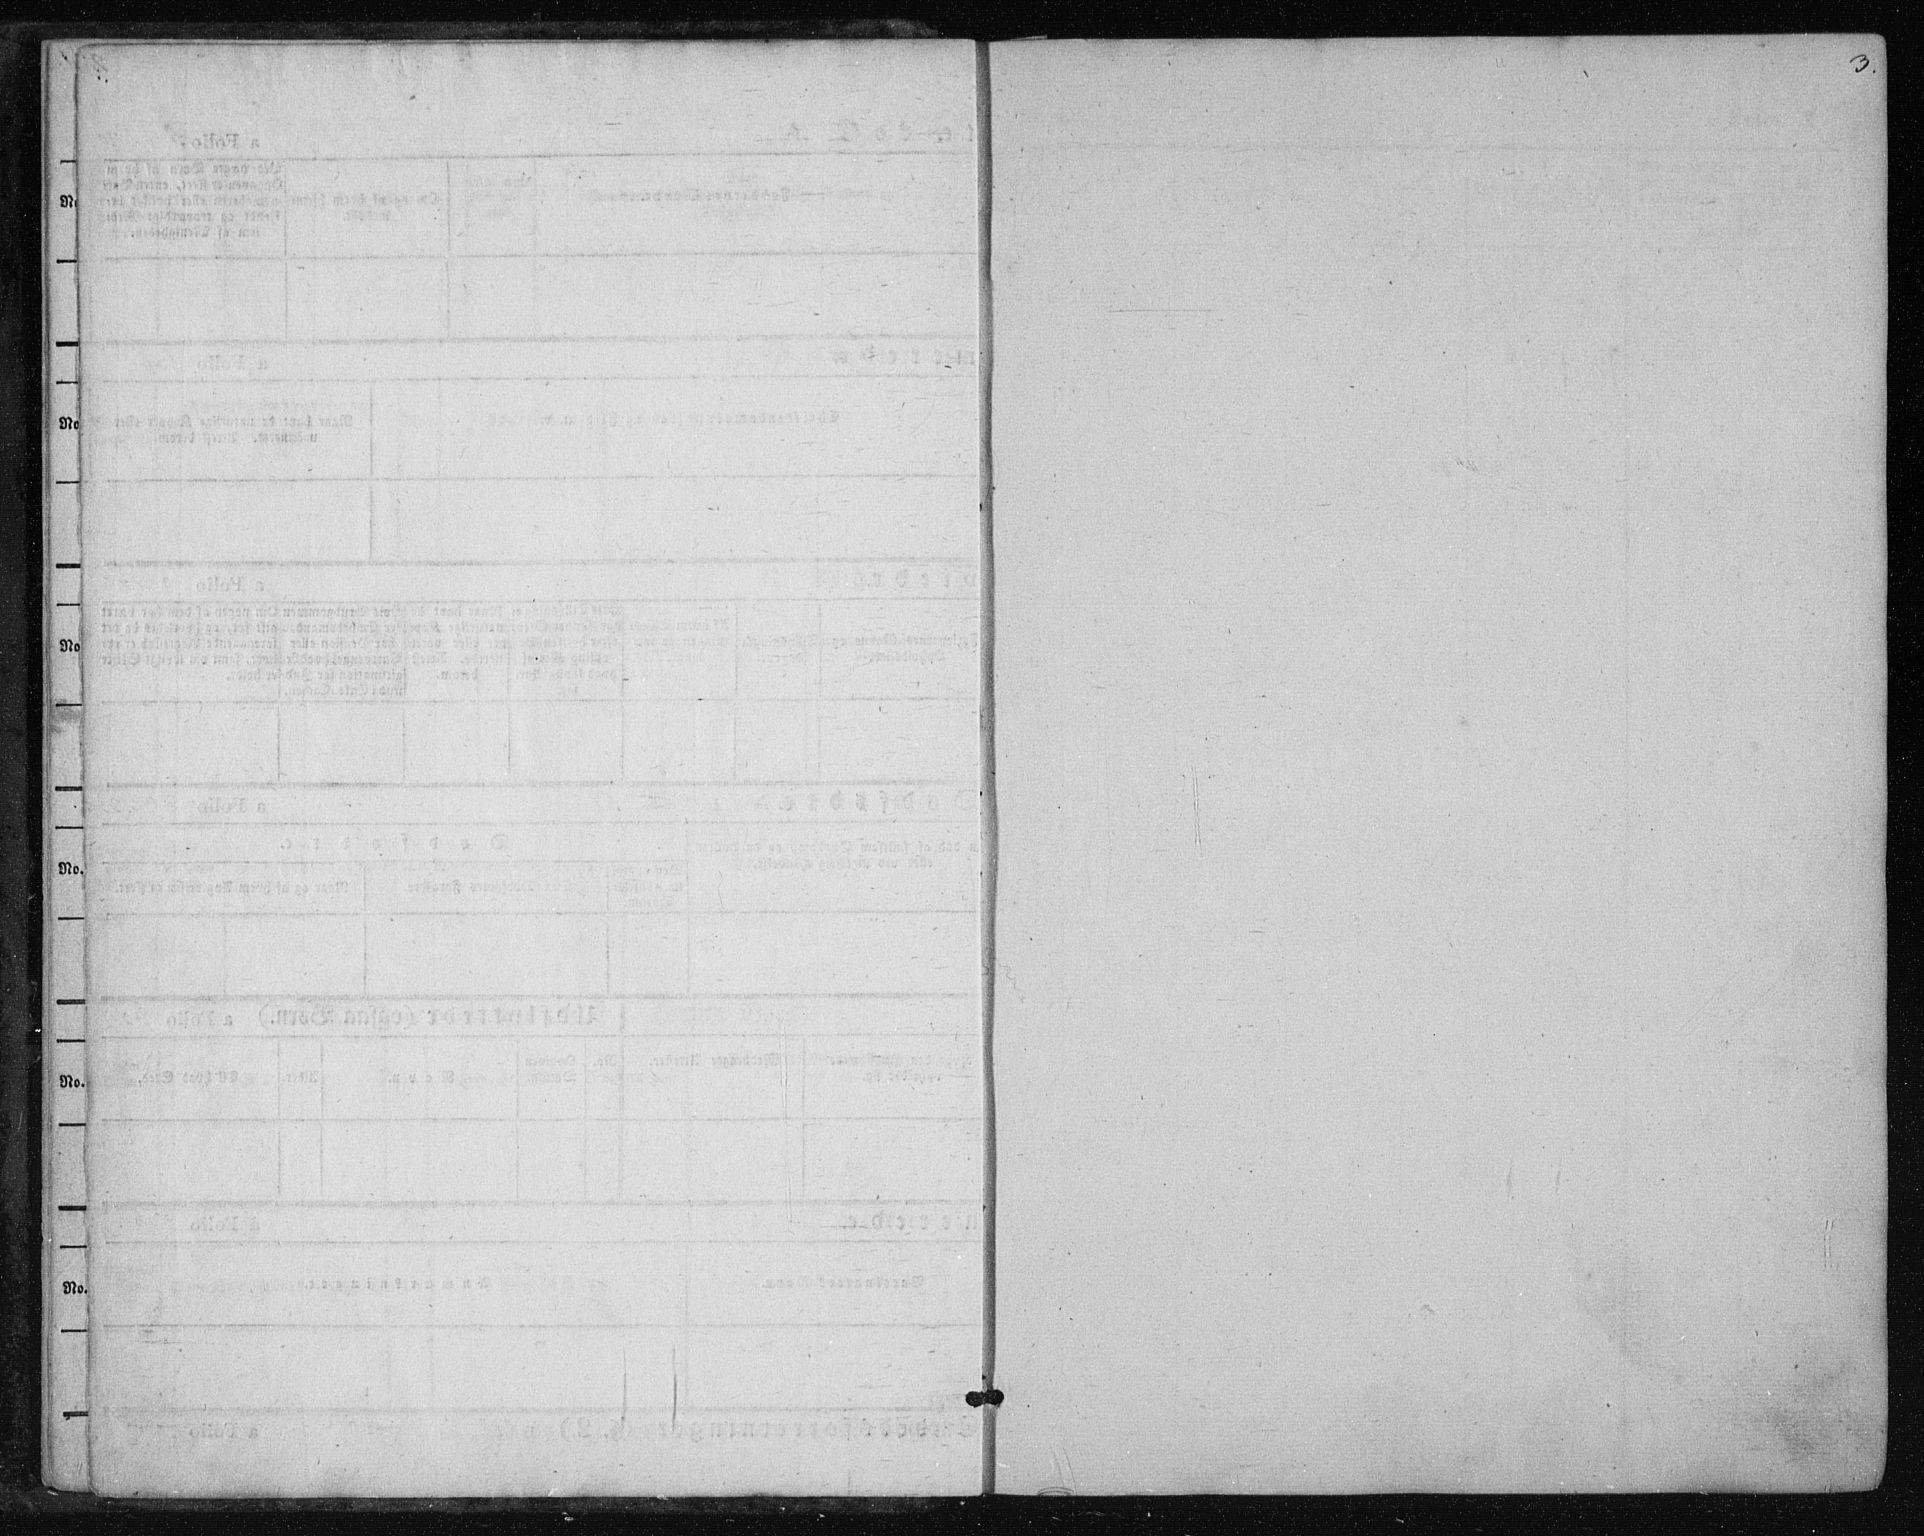 SAKO, Tinn kirkebøker, F/Fa/L0005: Parish register (official) no. I 5, 1844-1856, p. 3